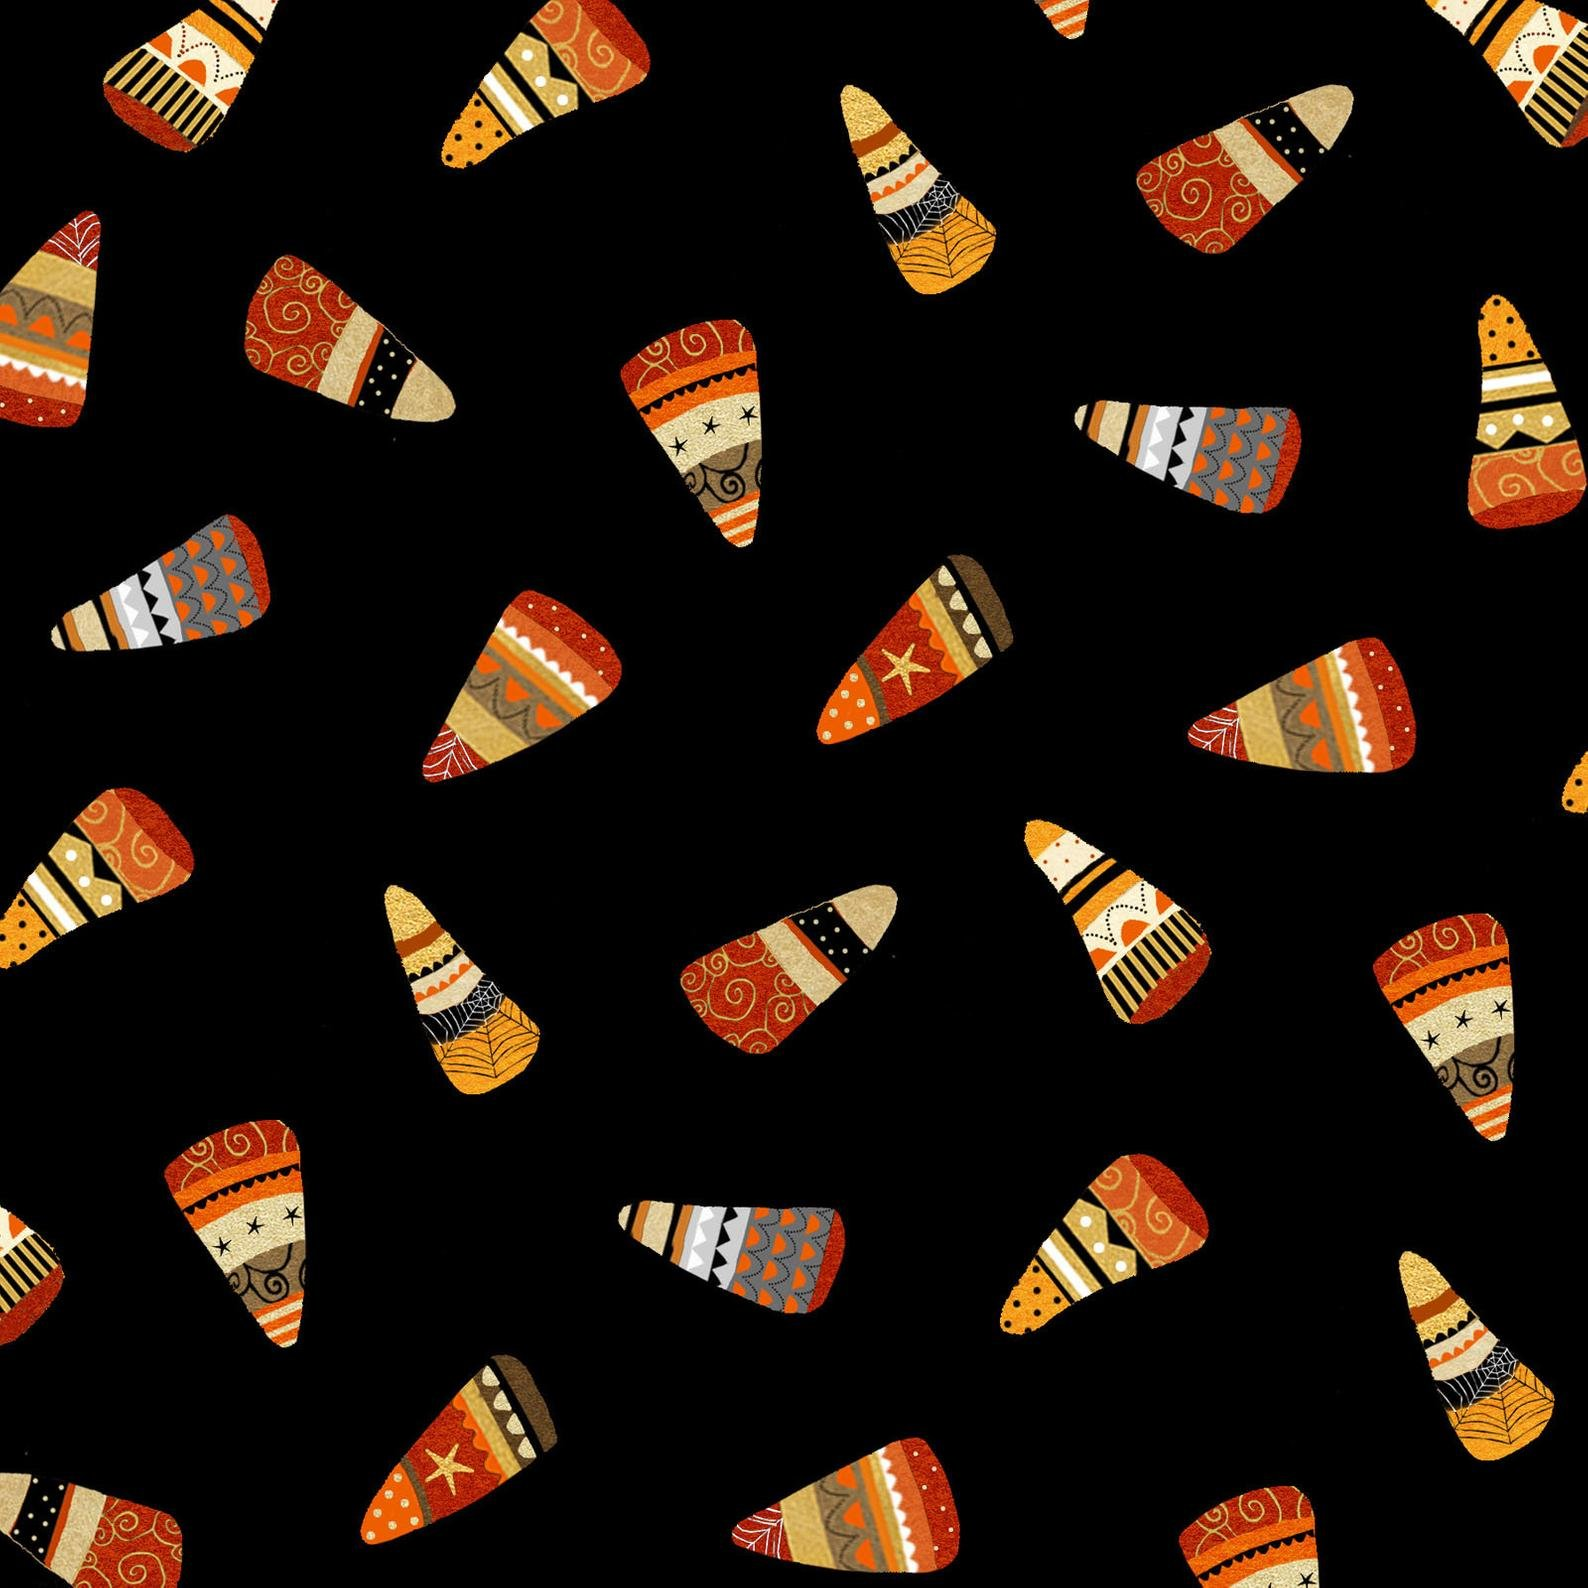 Cheekyville-acorn candy